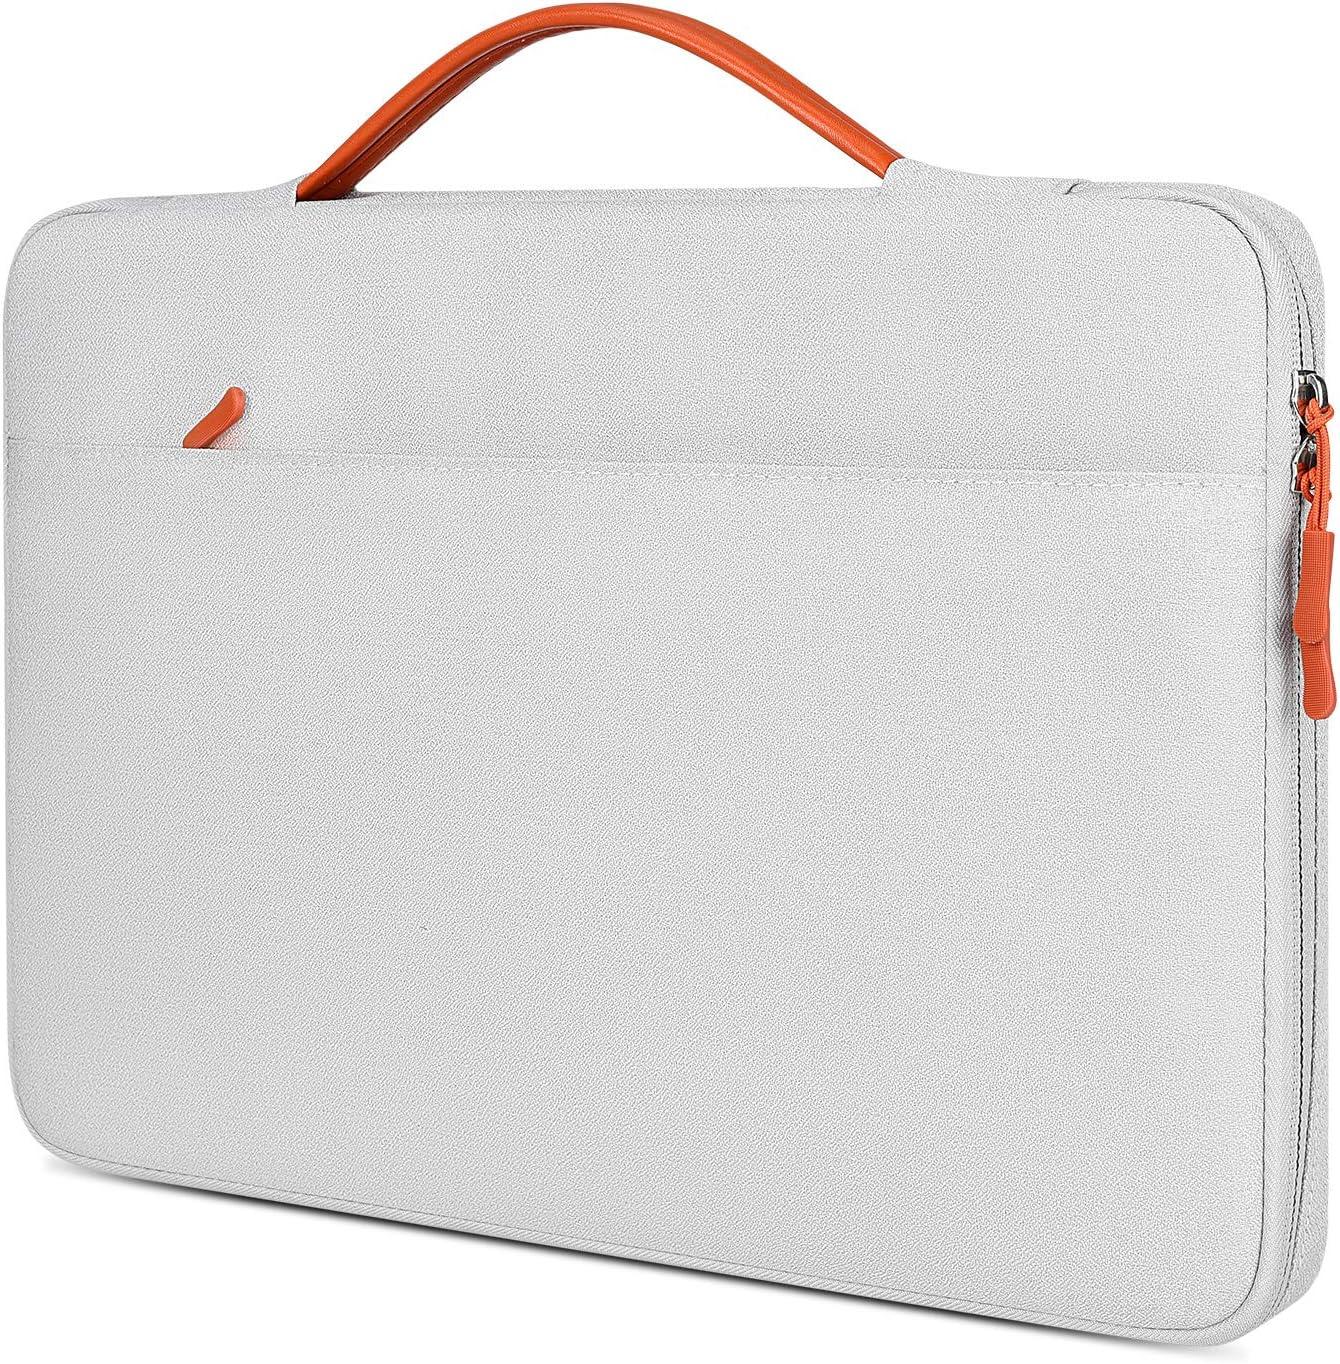 12.3-13.3 inch Waterpoof Laptop Case for Lenovo Yoga 730 720 13.3, HP Envy 13/Pavilion 13,Dell XPS 7390 9380/Latitude 13.3/Inspiron 13 5000 7000,ASUS ZenBook 13, Dell LG Acer ASUS Lenovo HP Laptop Bag